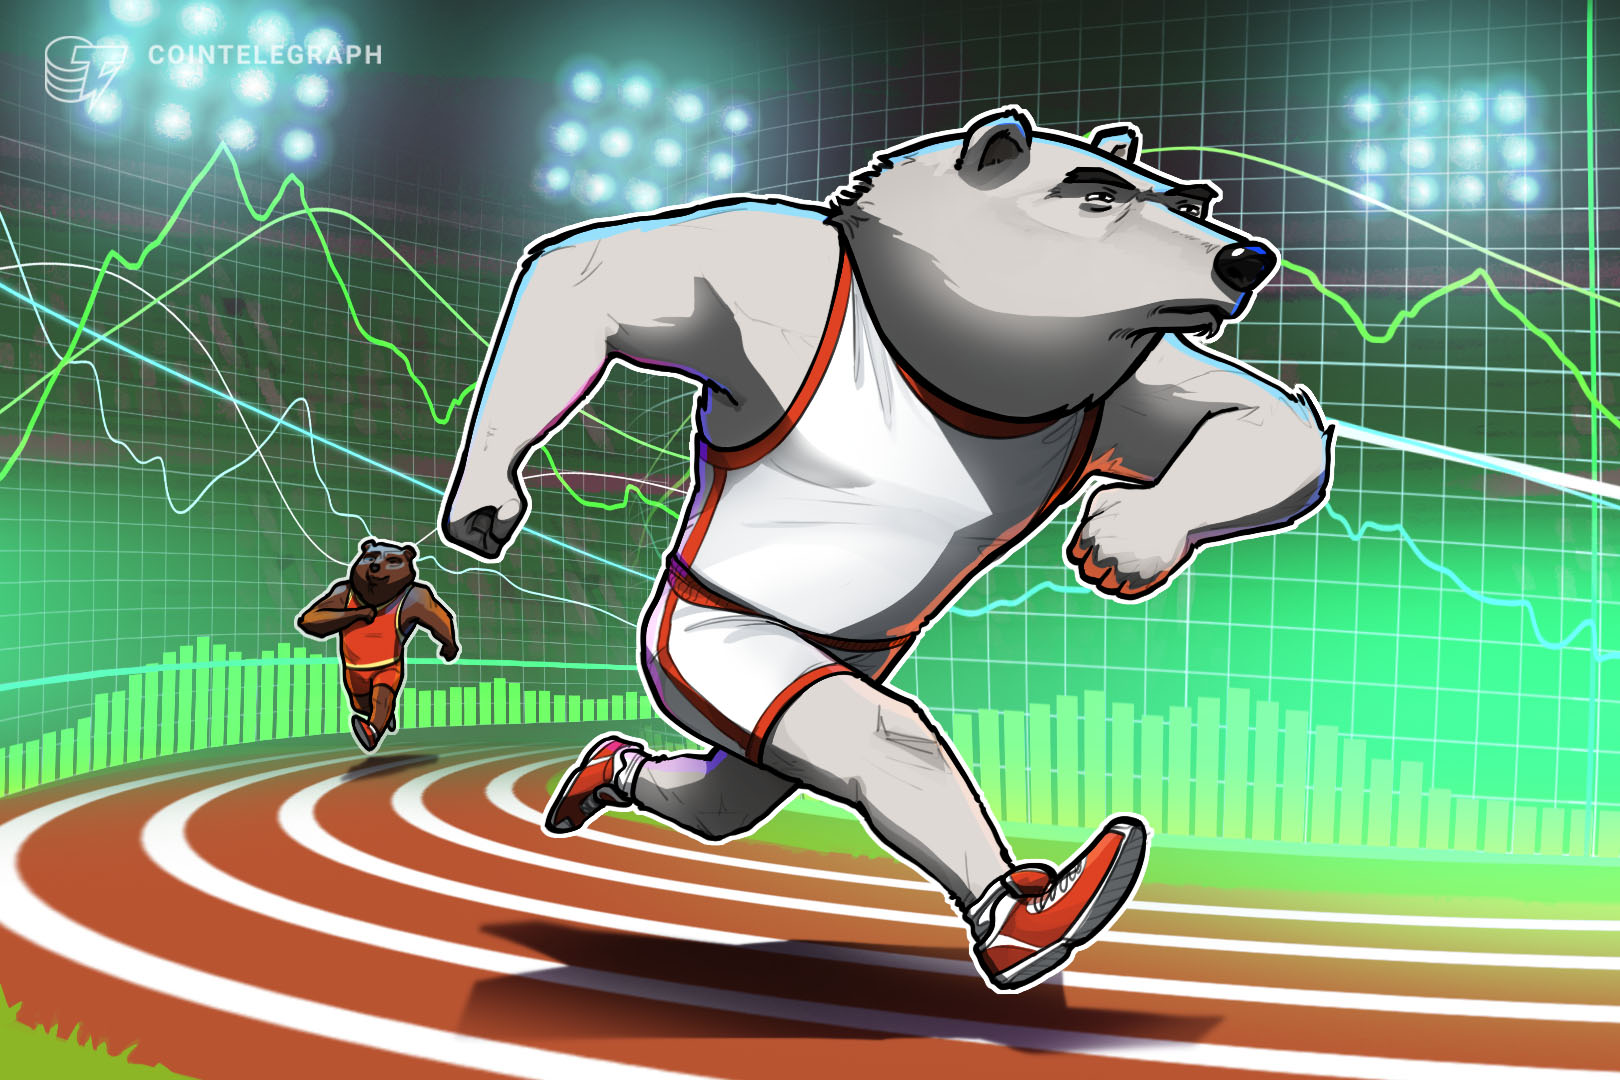 Bears back off, but Bitcoin price still wavers below $35K